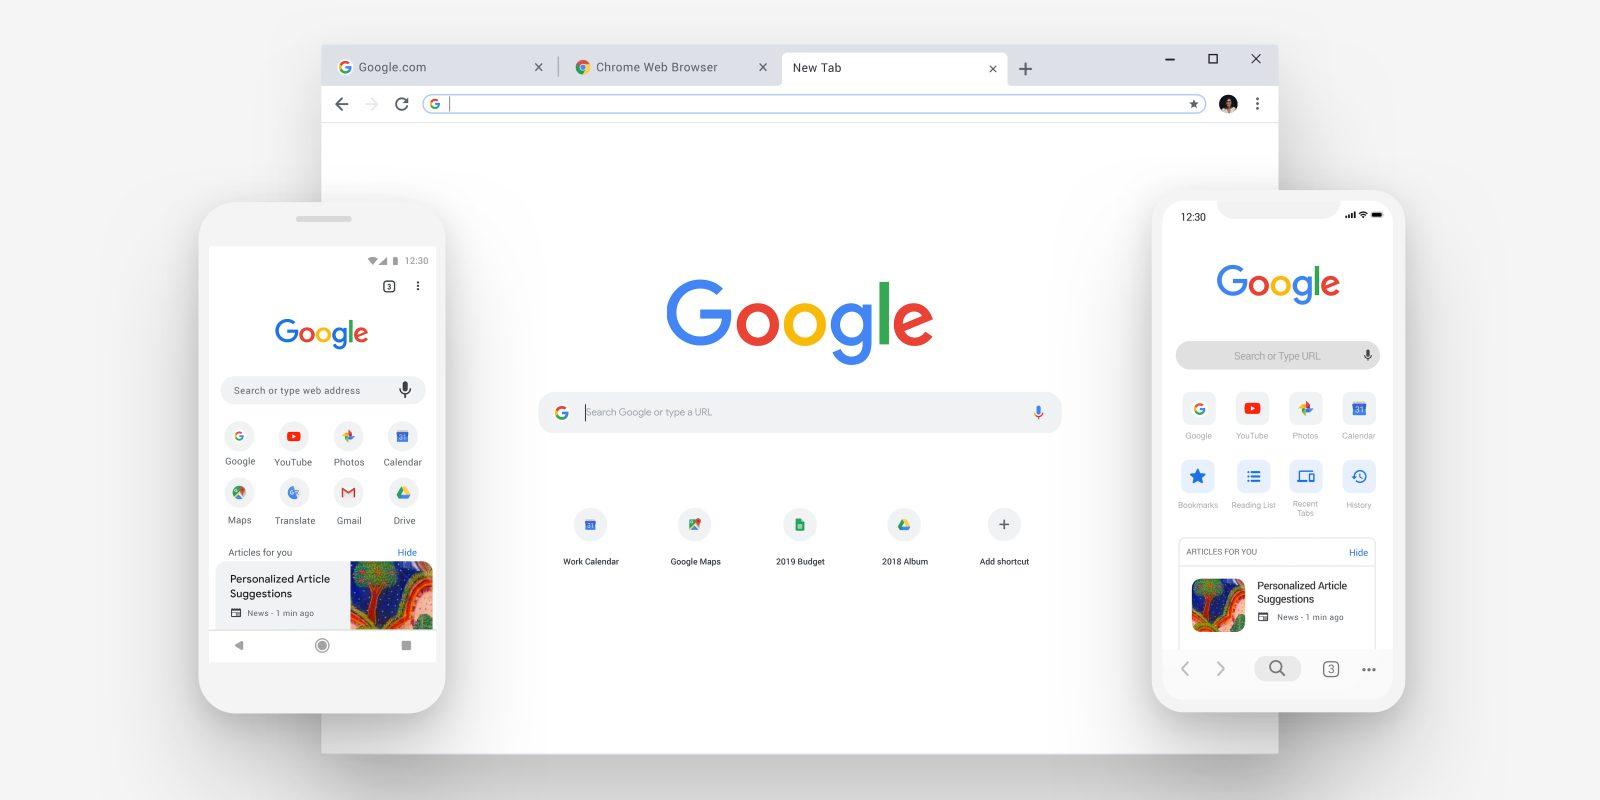 Gruppi di schede personalizzabili in Google Chrome